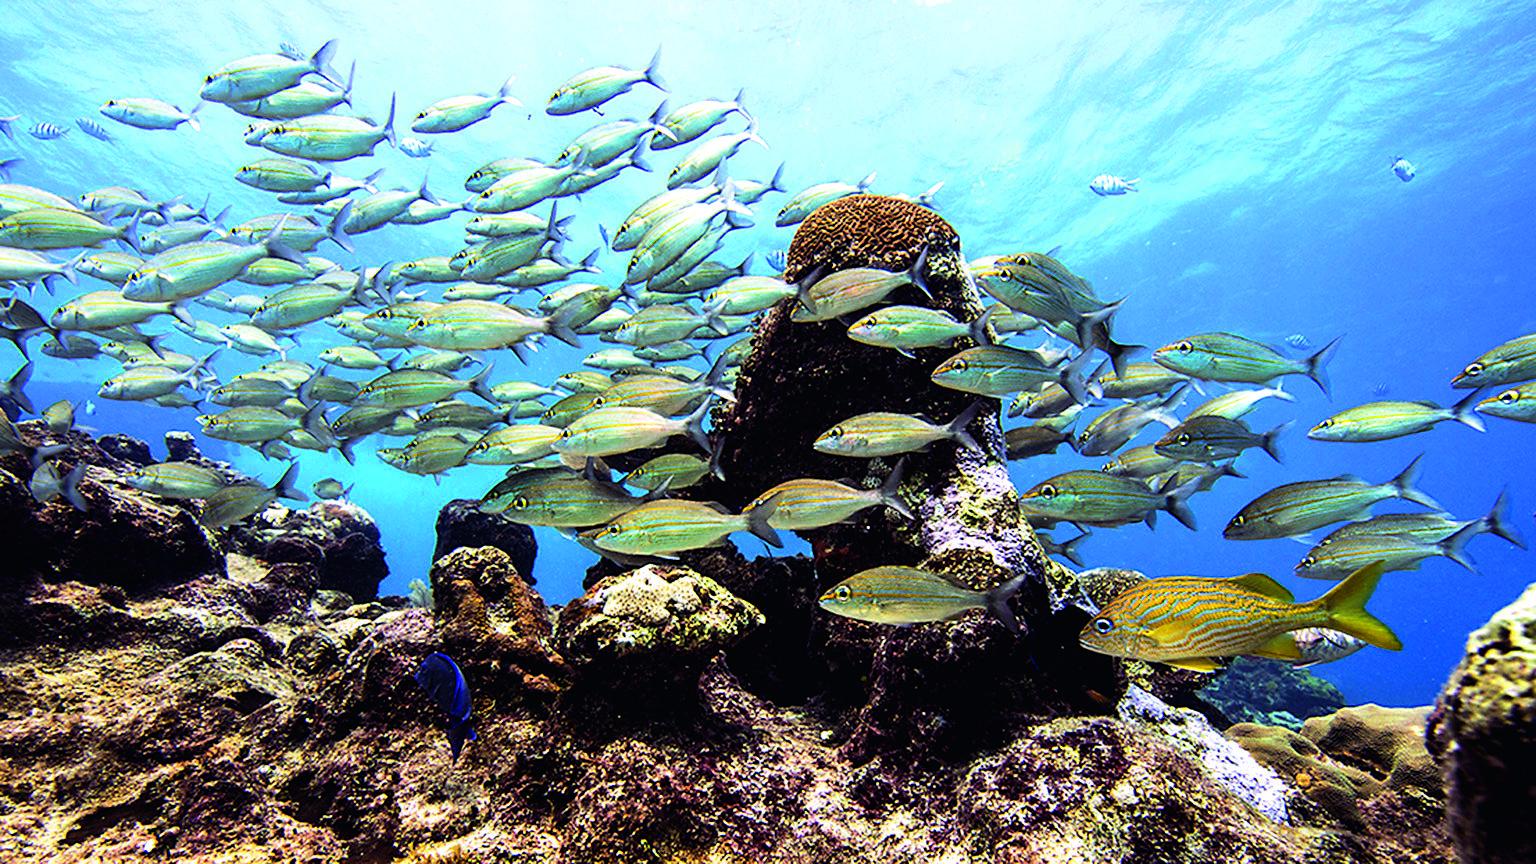 Mar Vivo deslumbra con fotografías submarinas